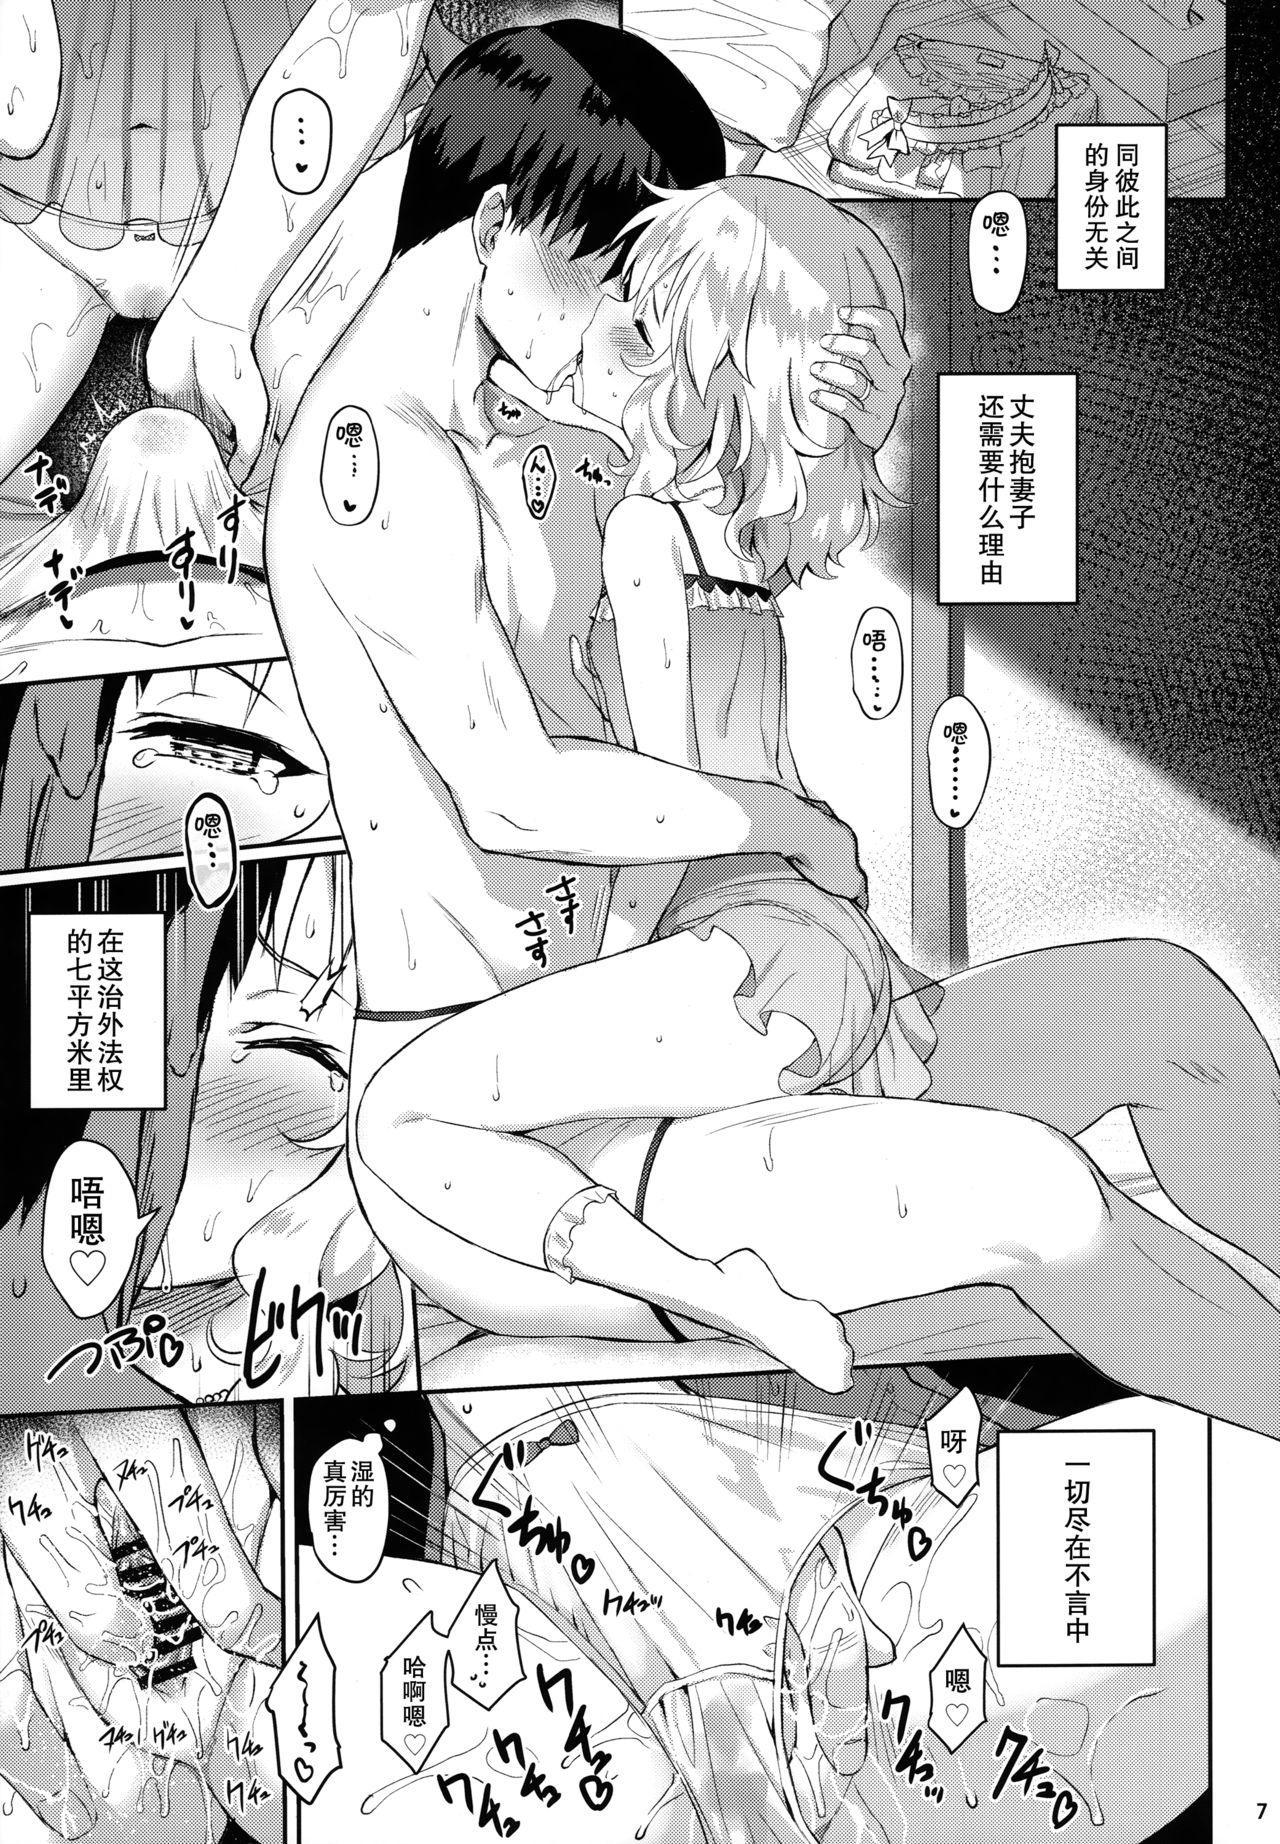 (My Best Friends 12) [Horizontal World (Matanonki) Momoka Yoitsuma (THE IDOLM@STER CINDERELLA GIRLS) [Chinese] [匿名无名+无名抓来的两只动物帮忙汉化] 6